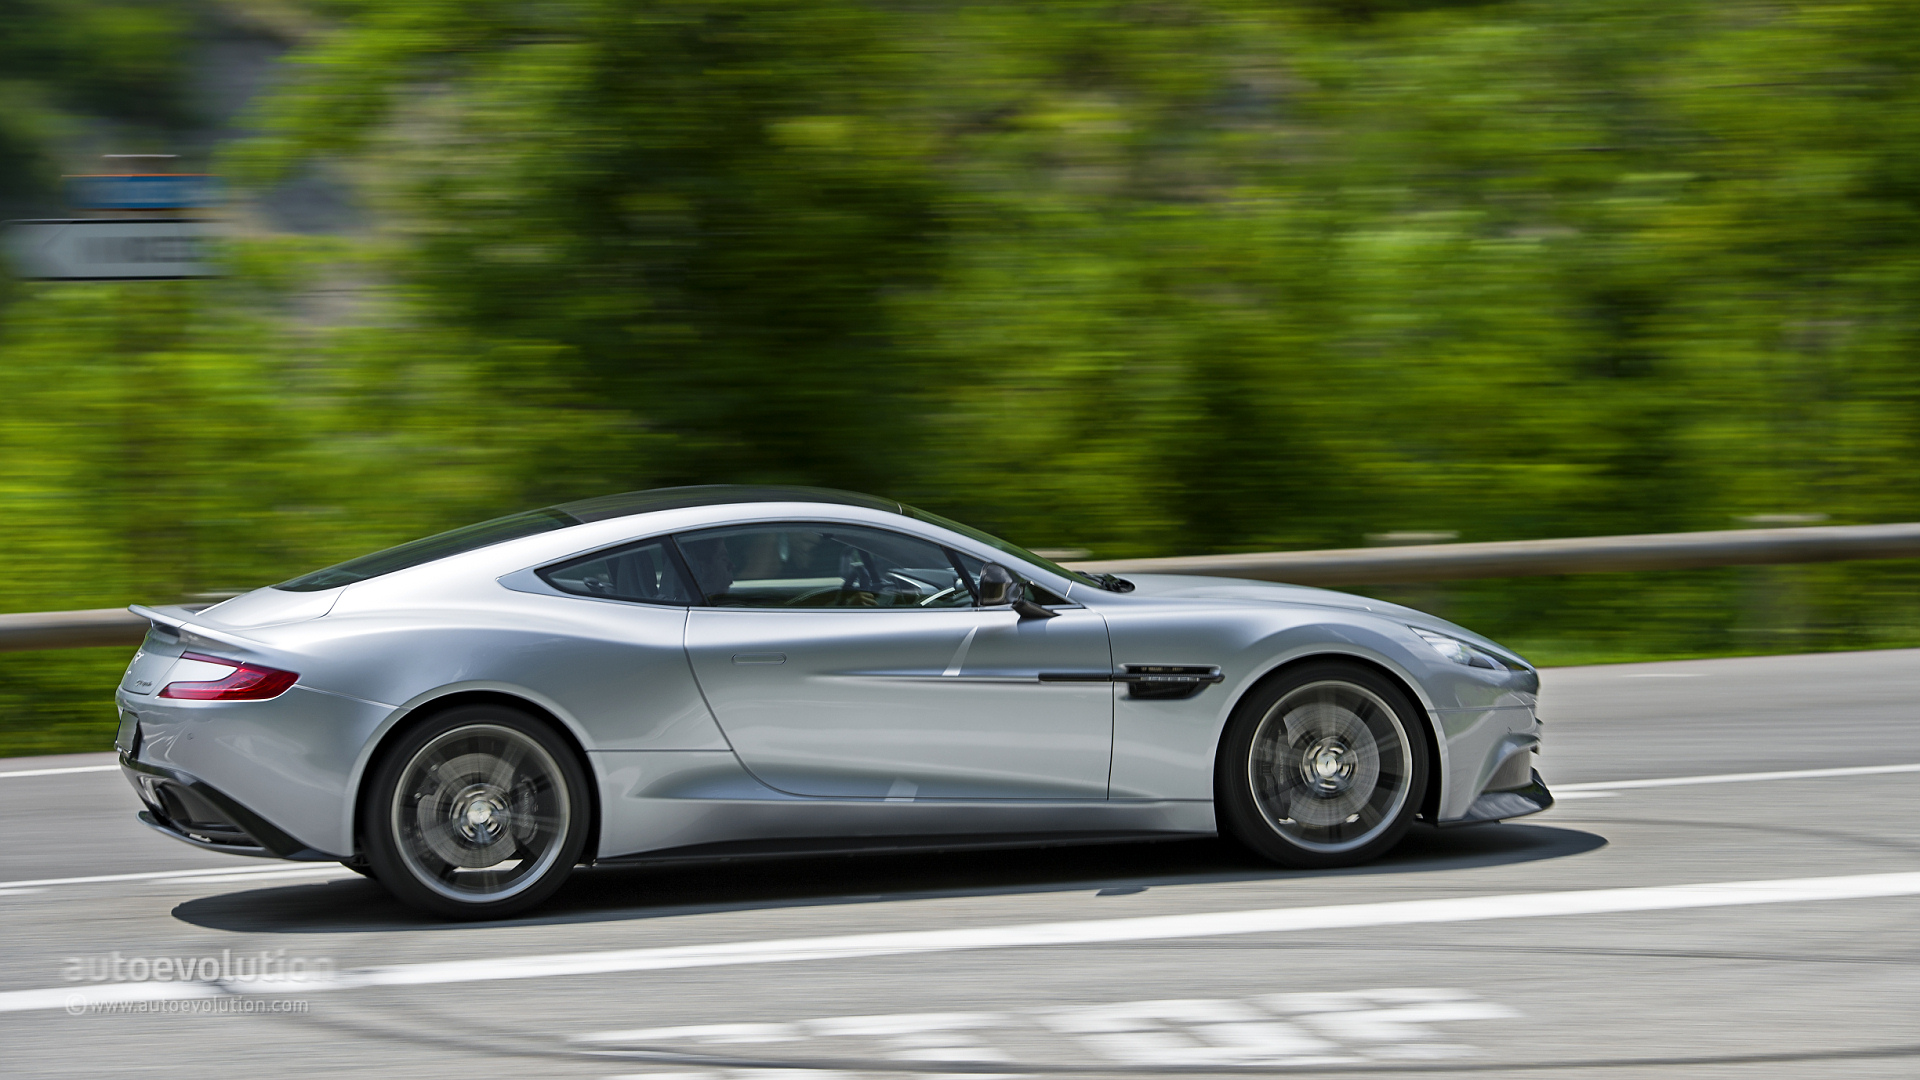 Aston Martin Vanqush 2014